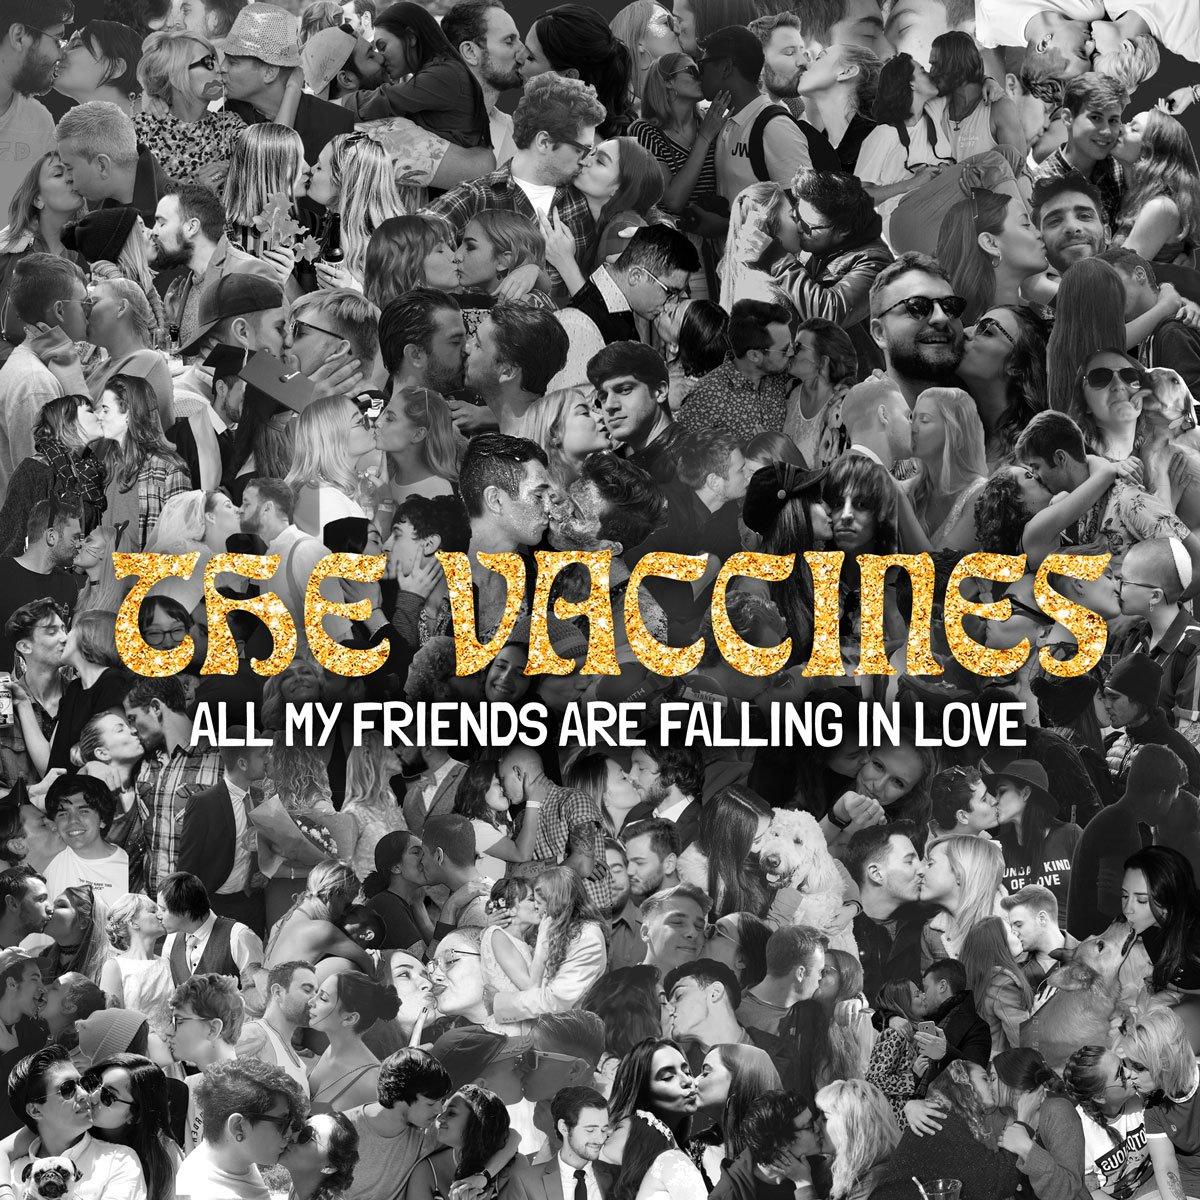 Brèves – The Vaccines, The Twilight Sad, Superfizzee